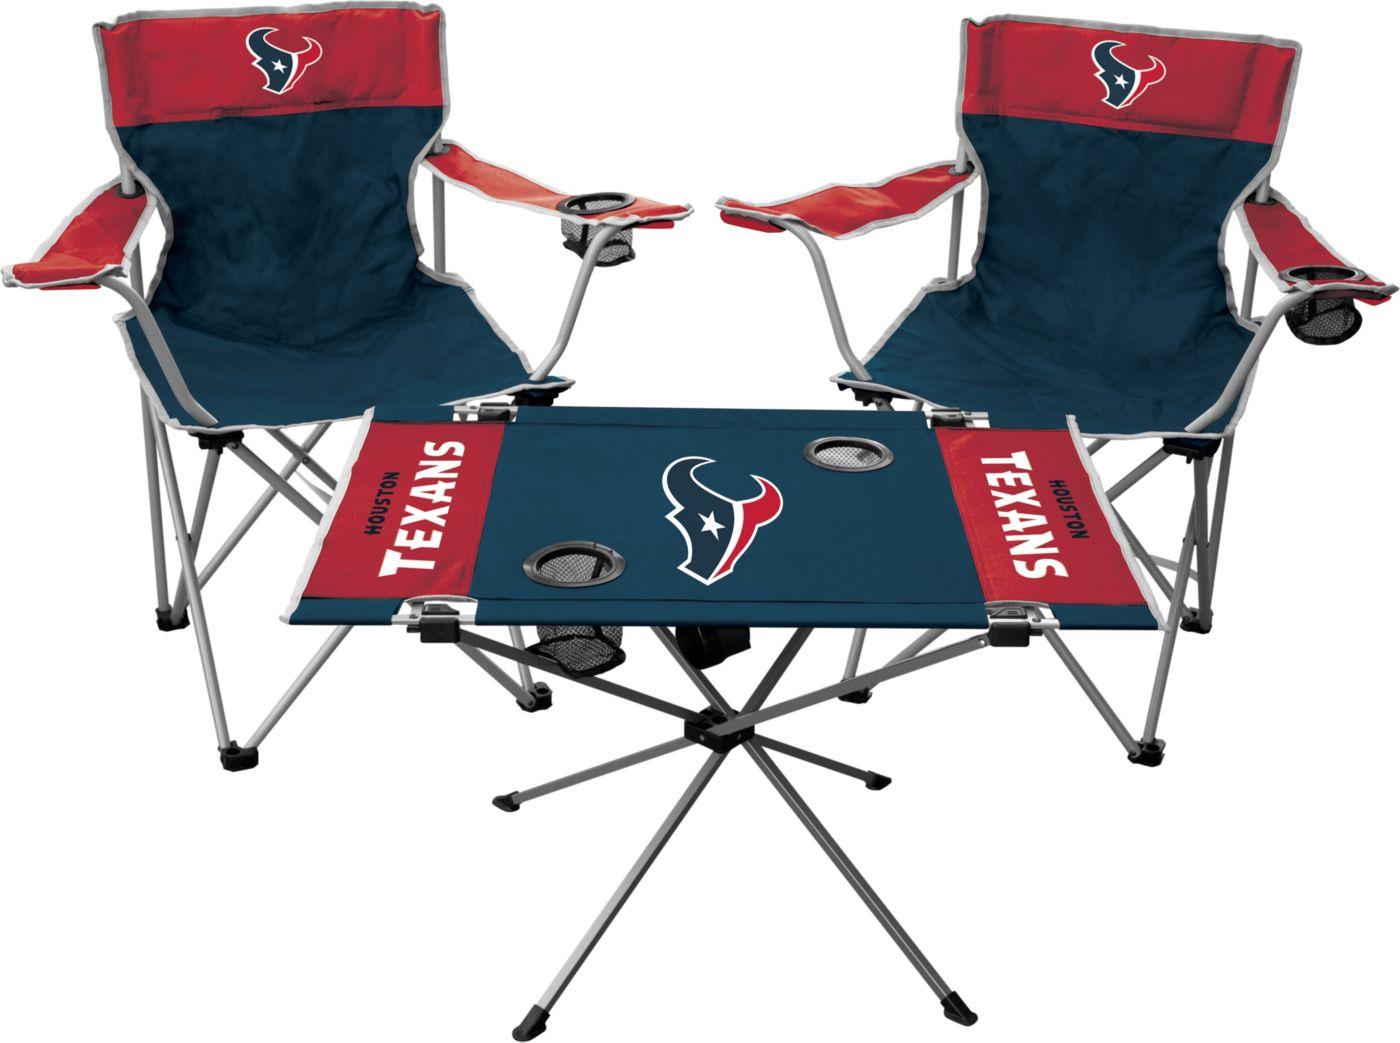 Rawlings Houston Texans Tailgate Kit